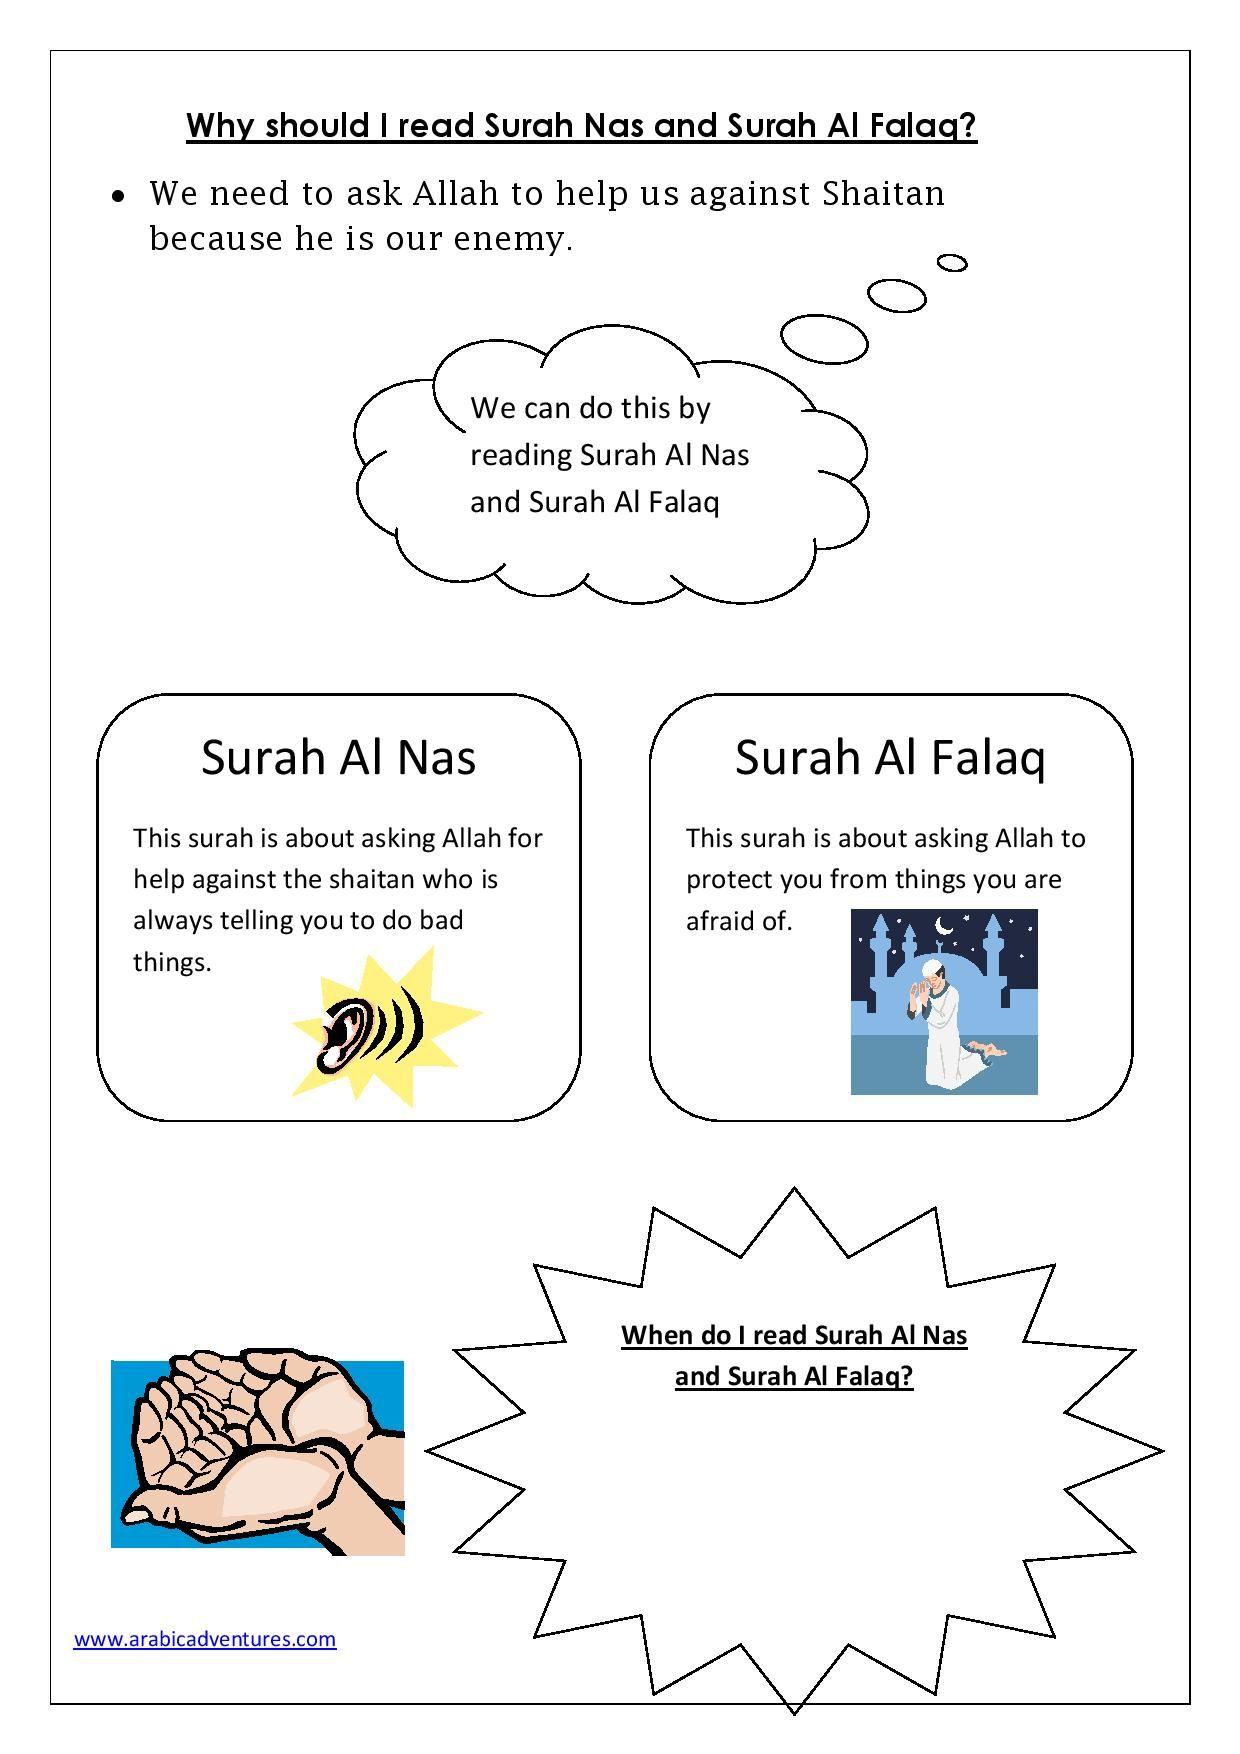 Why Should I Read Surah Nas And Surah Al Falaq Page